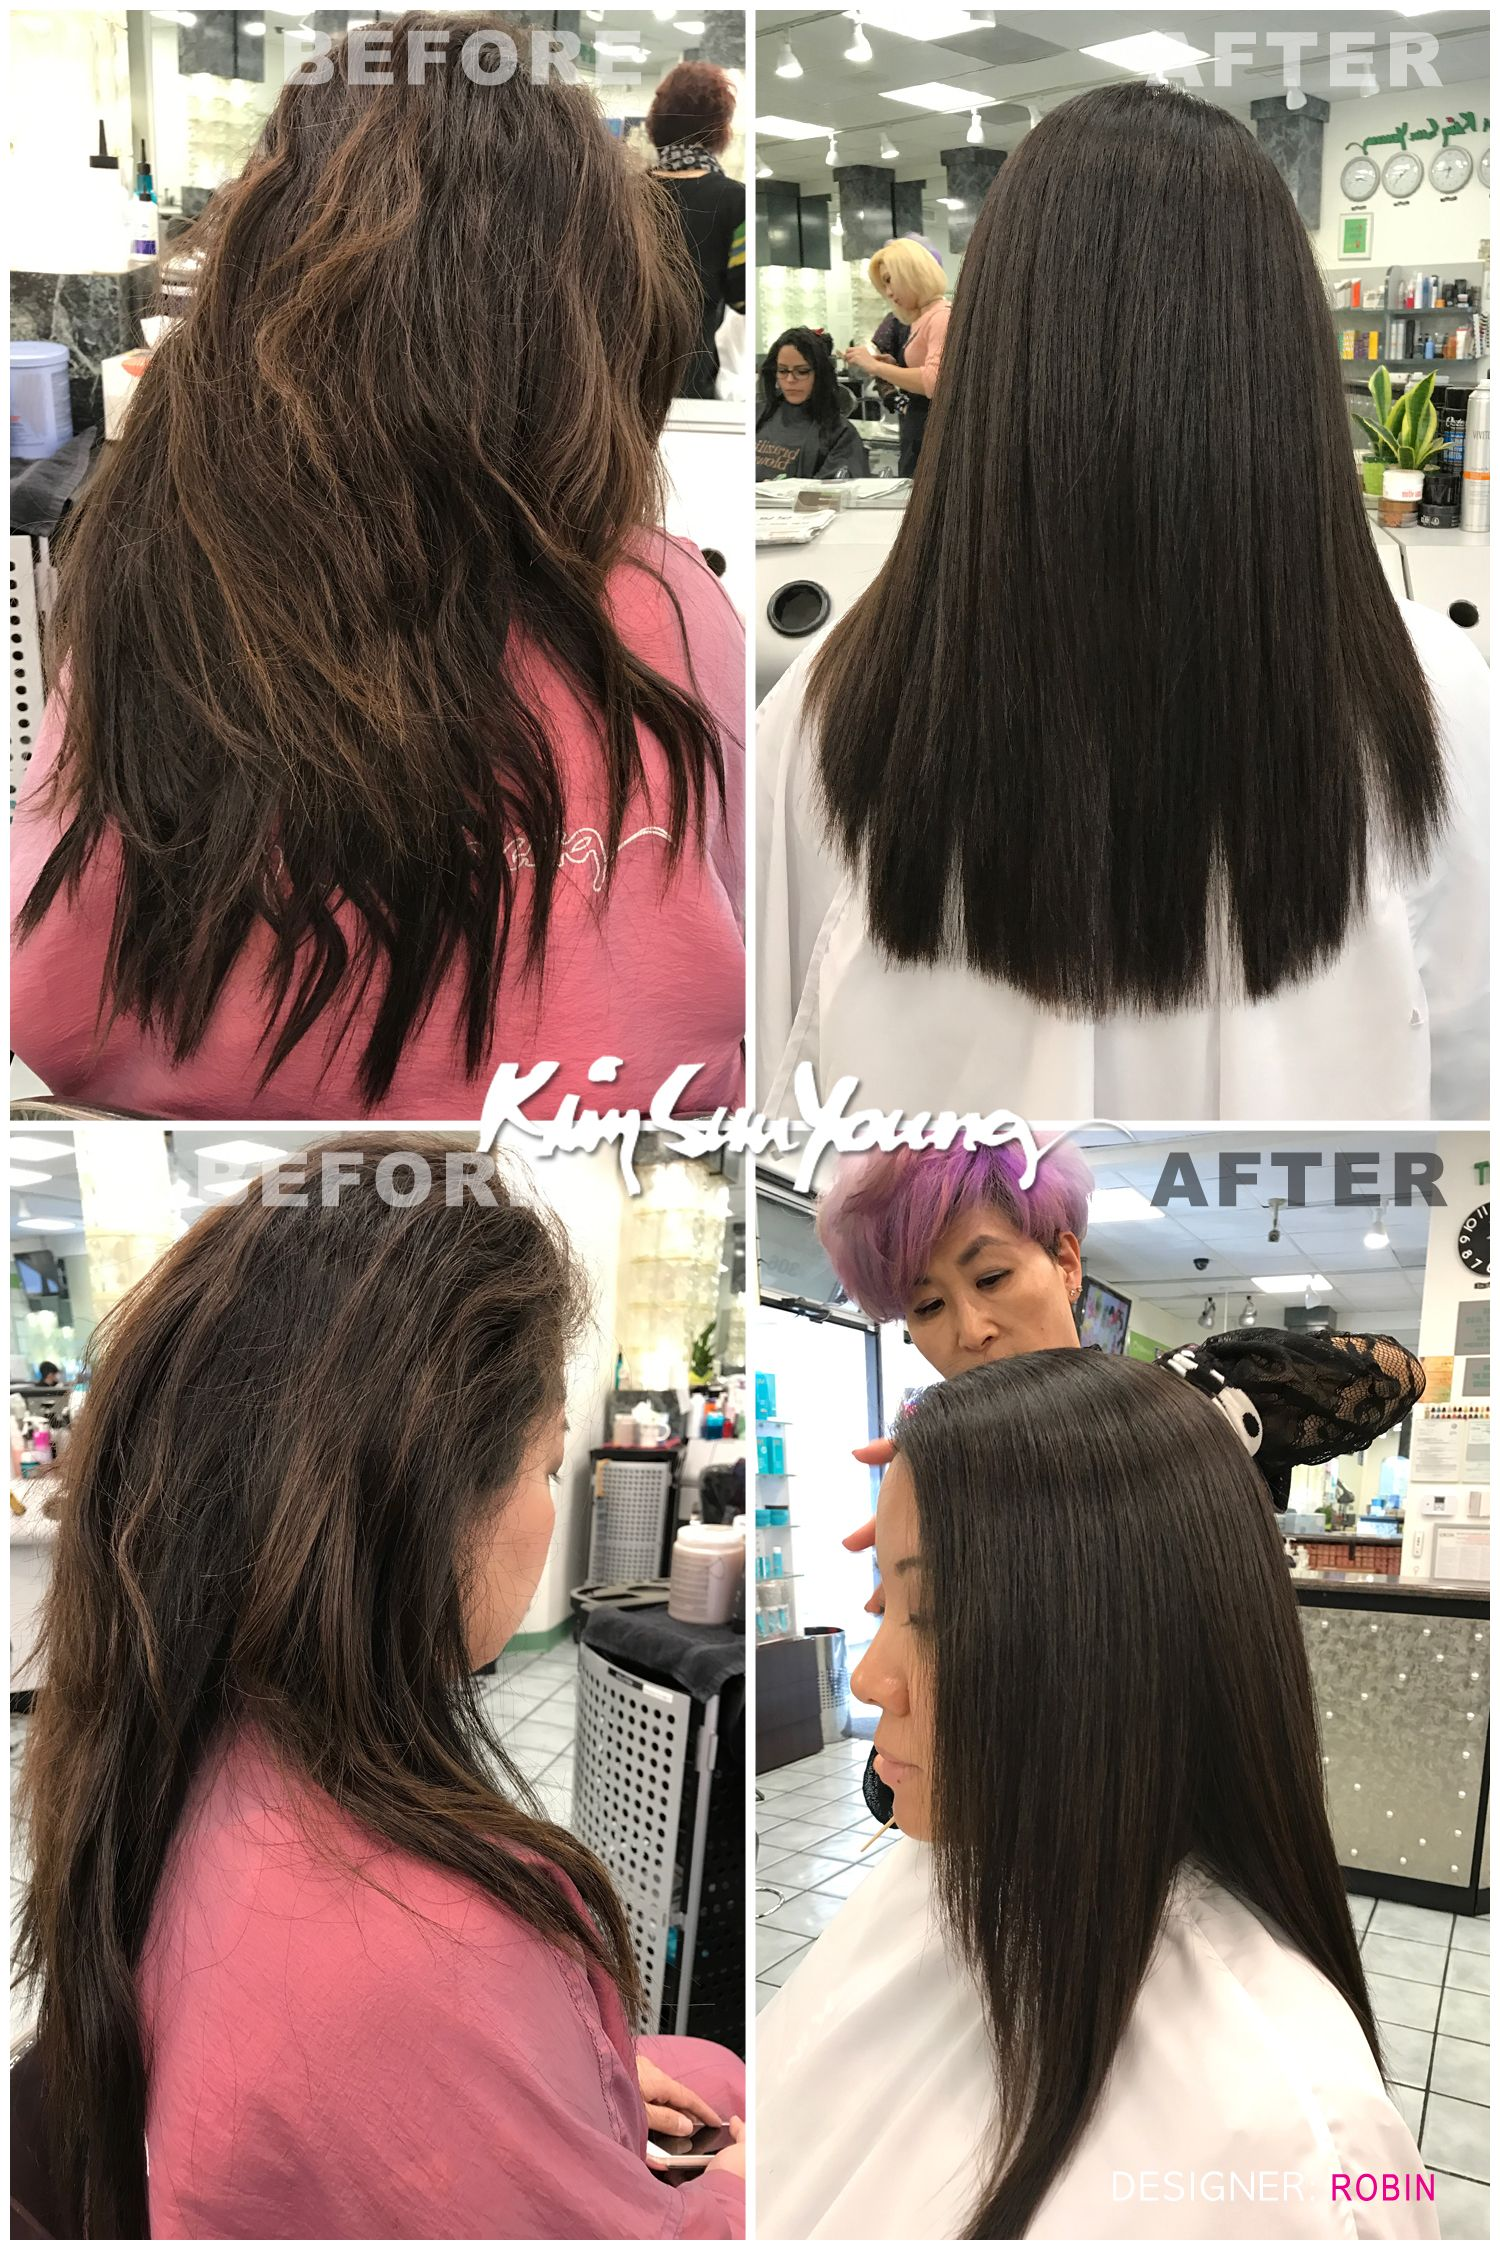 Magic straight perm at home - Magic Straight Perm By Robin At Ksy Kim Sun Young Beauty Salon